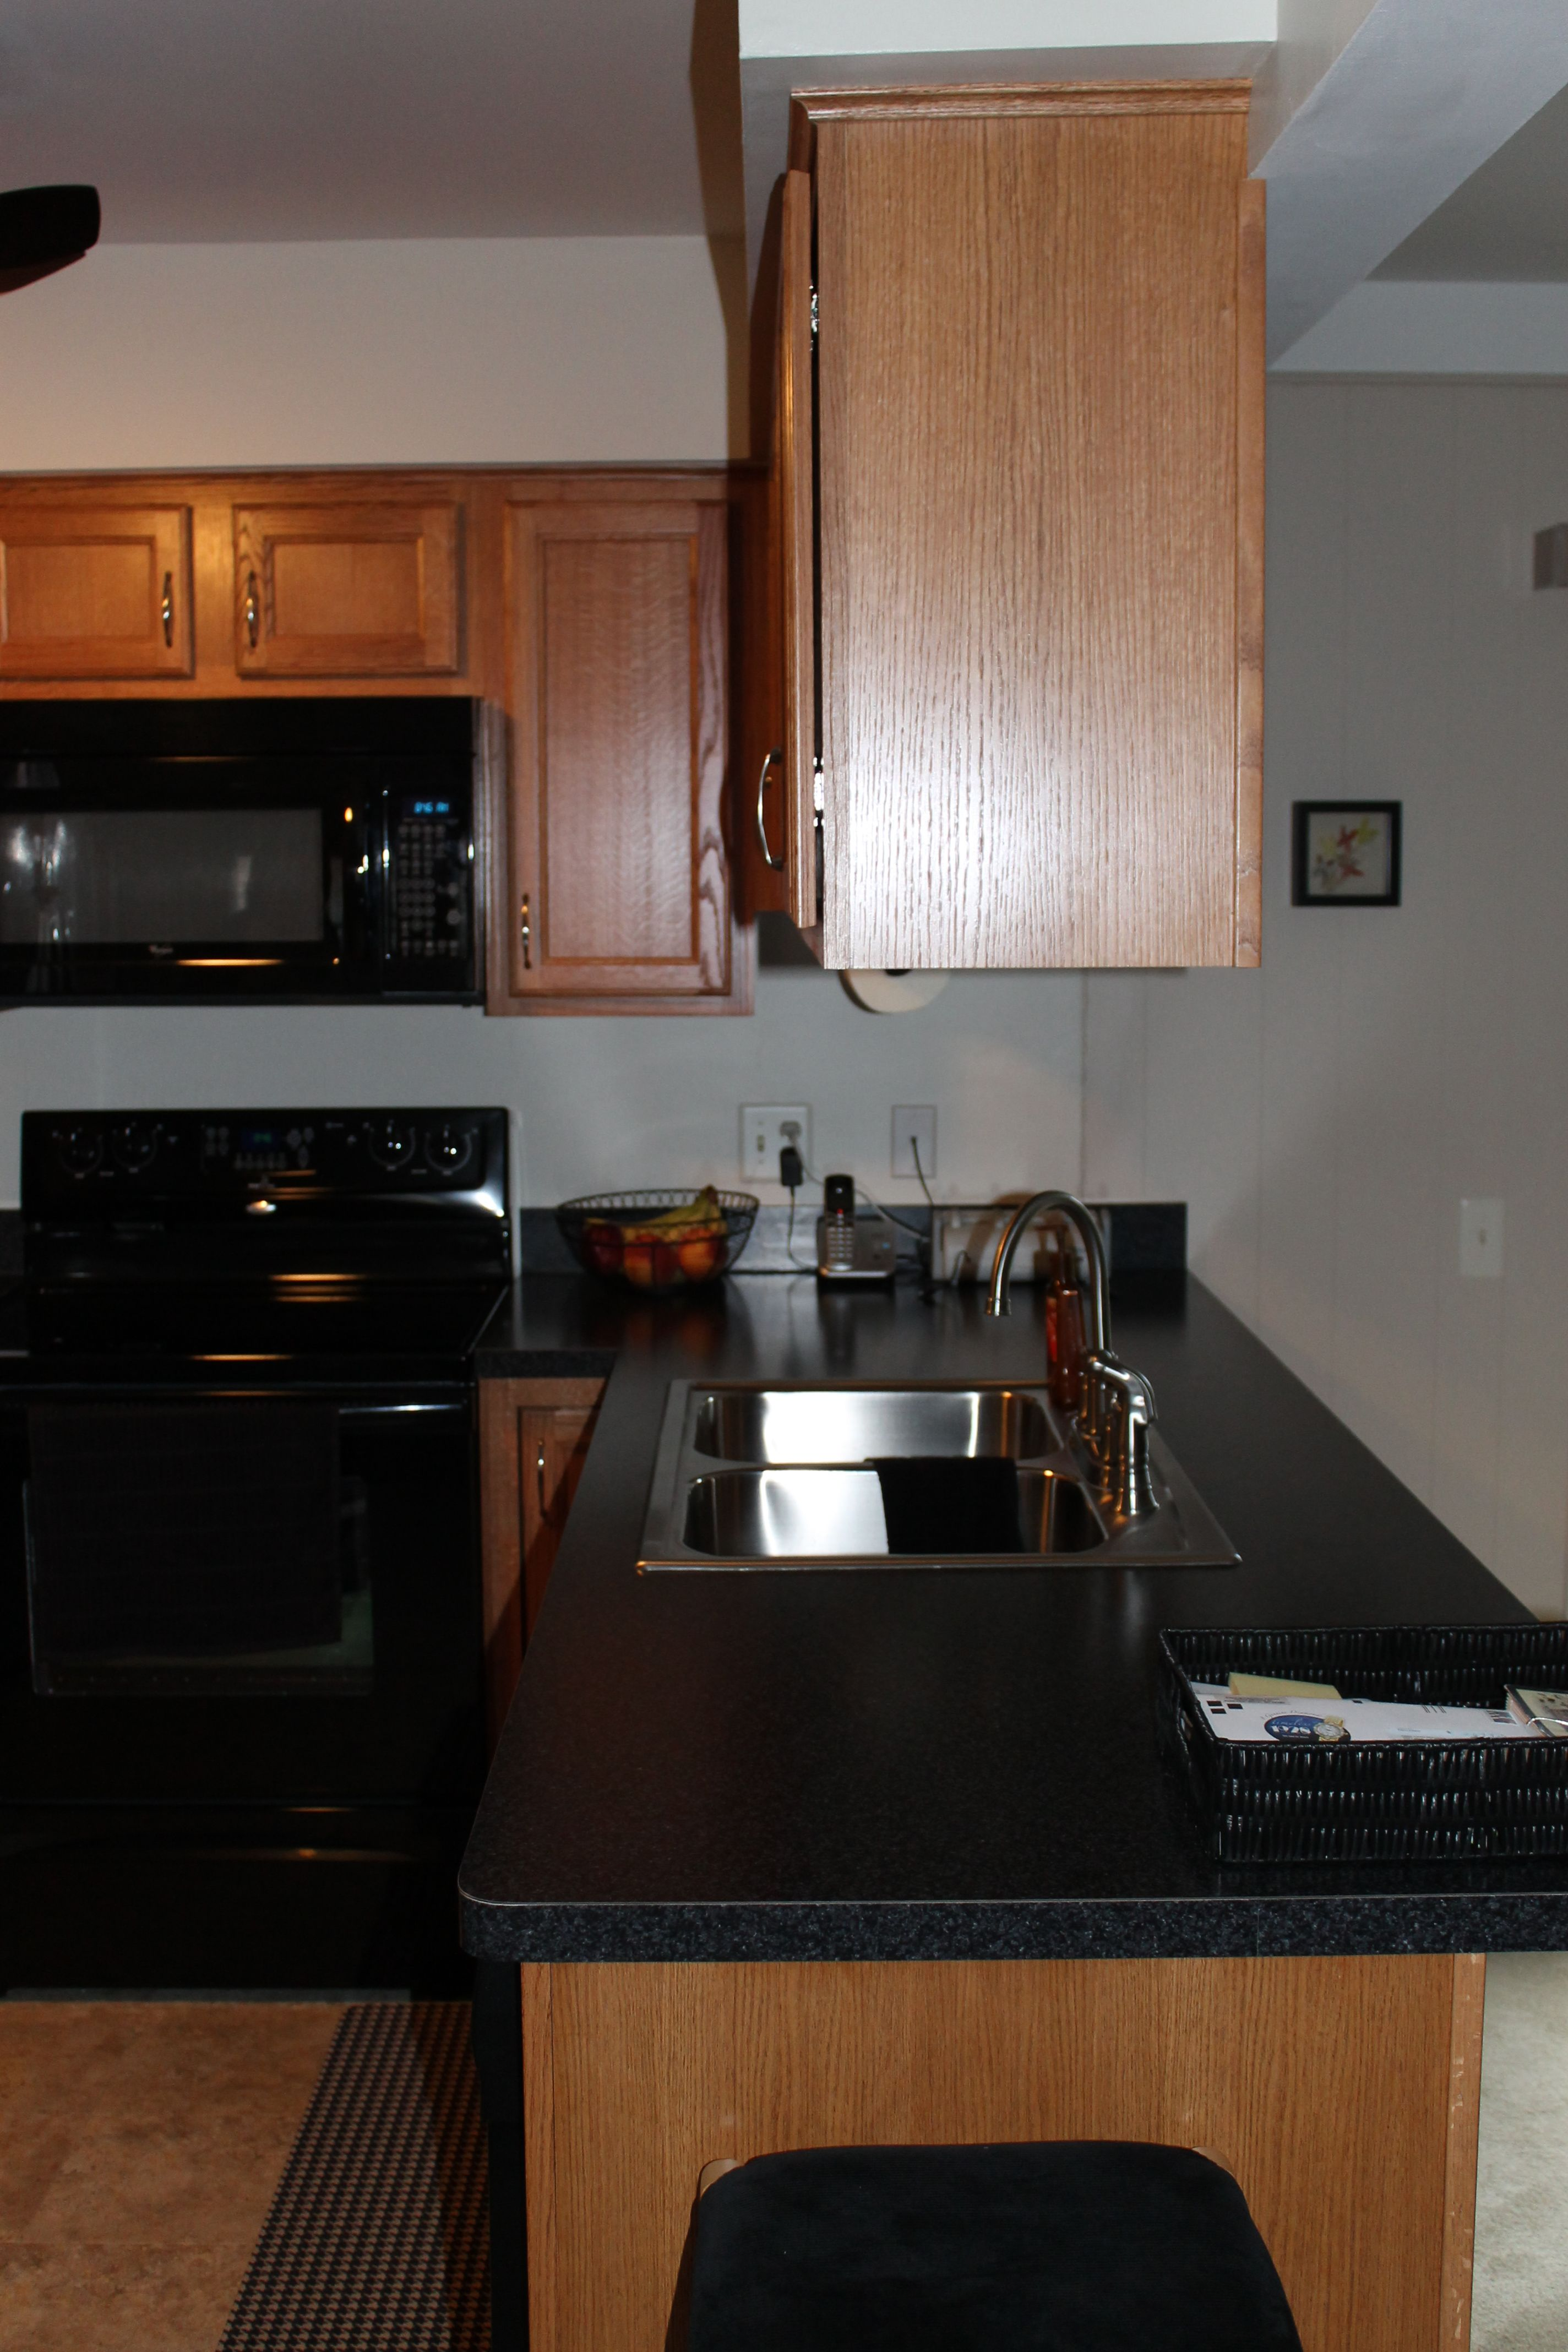 Medium/light Shaker Style Cabinetry Peninsula Area With